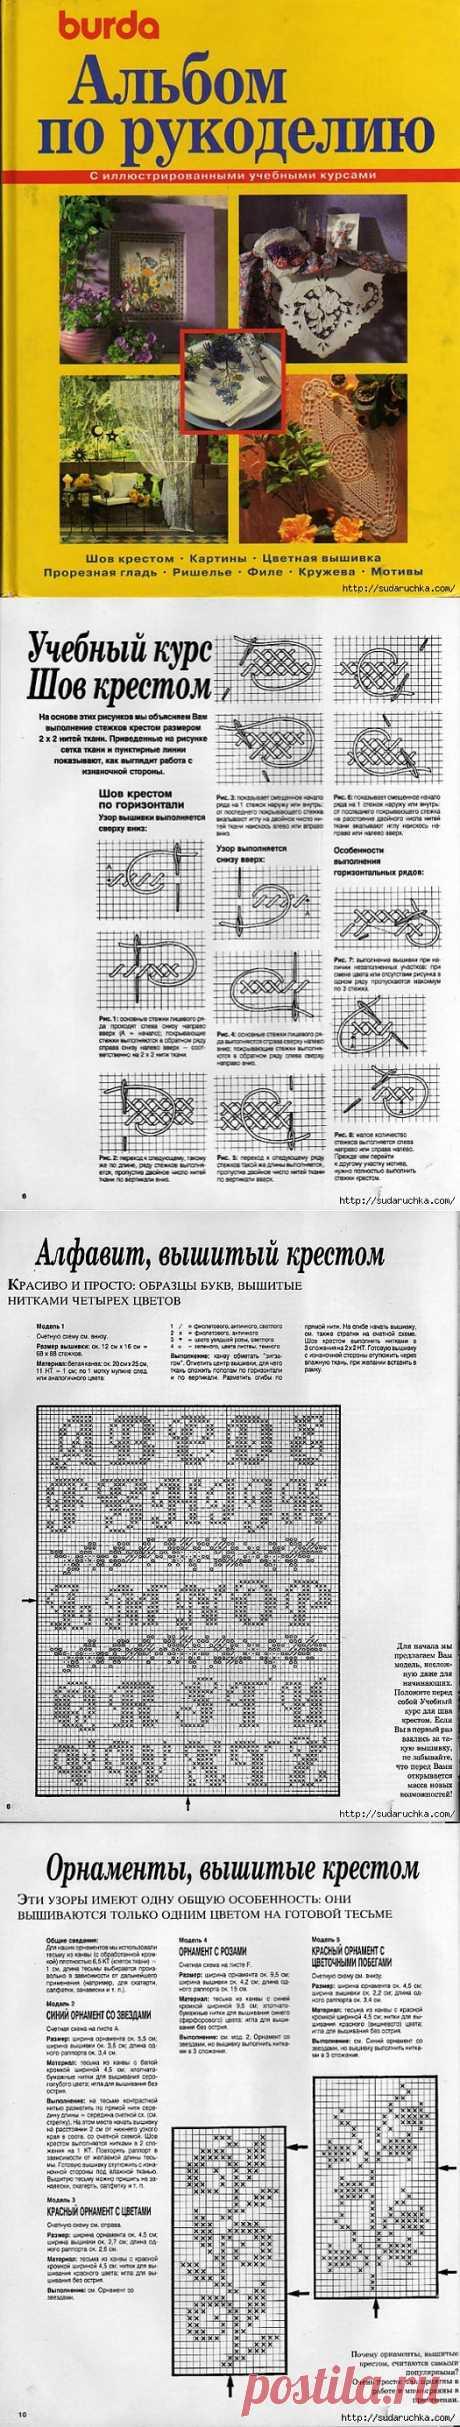 """Альбом on needlework Burda"". The magazine on an embroidery and knitting."